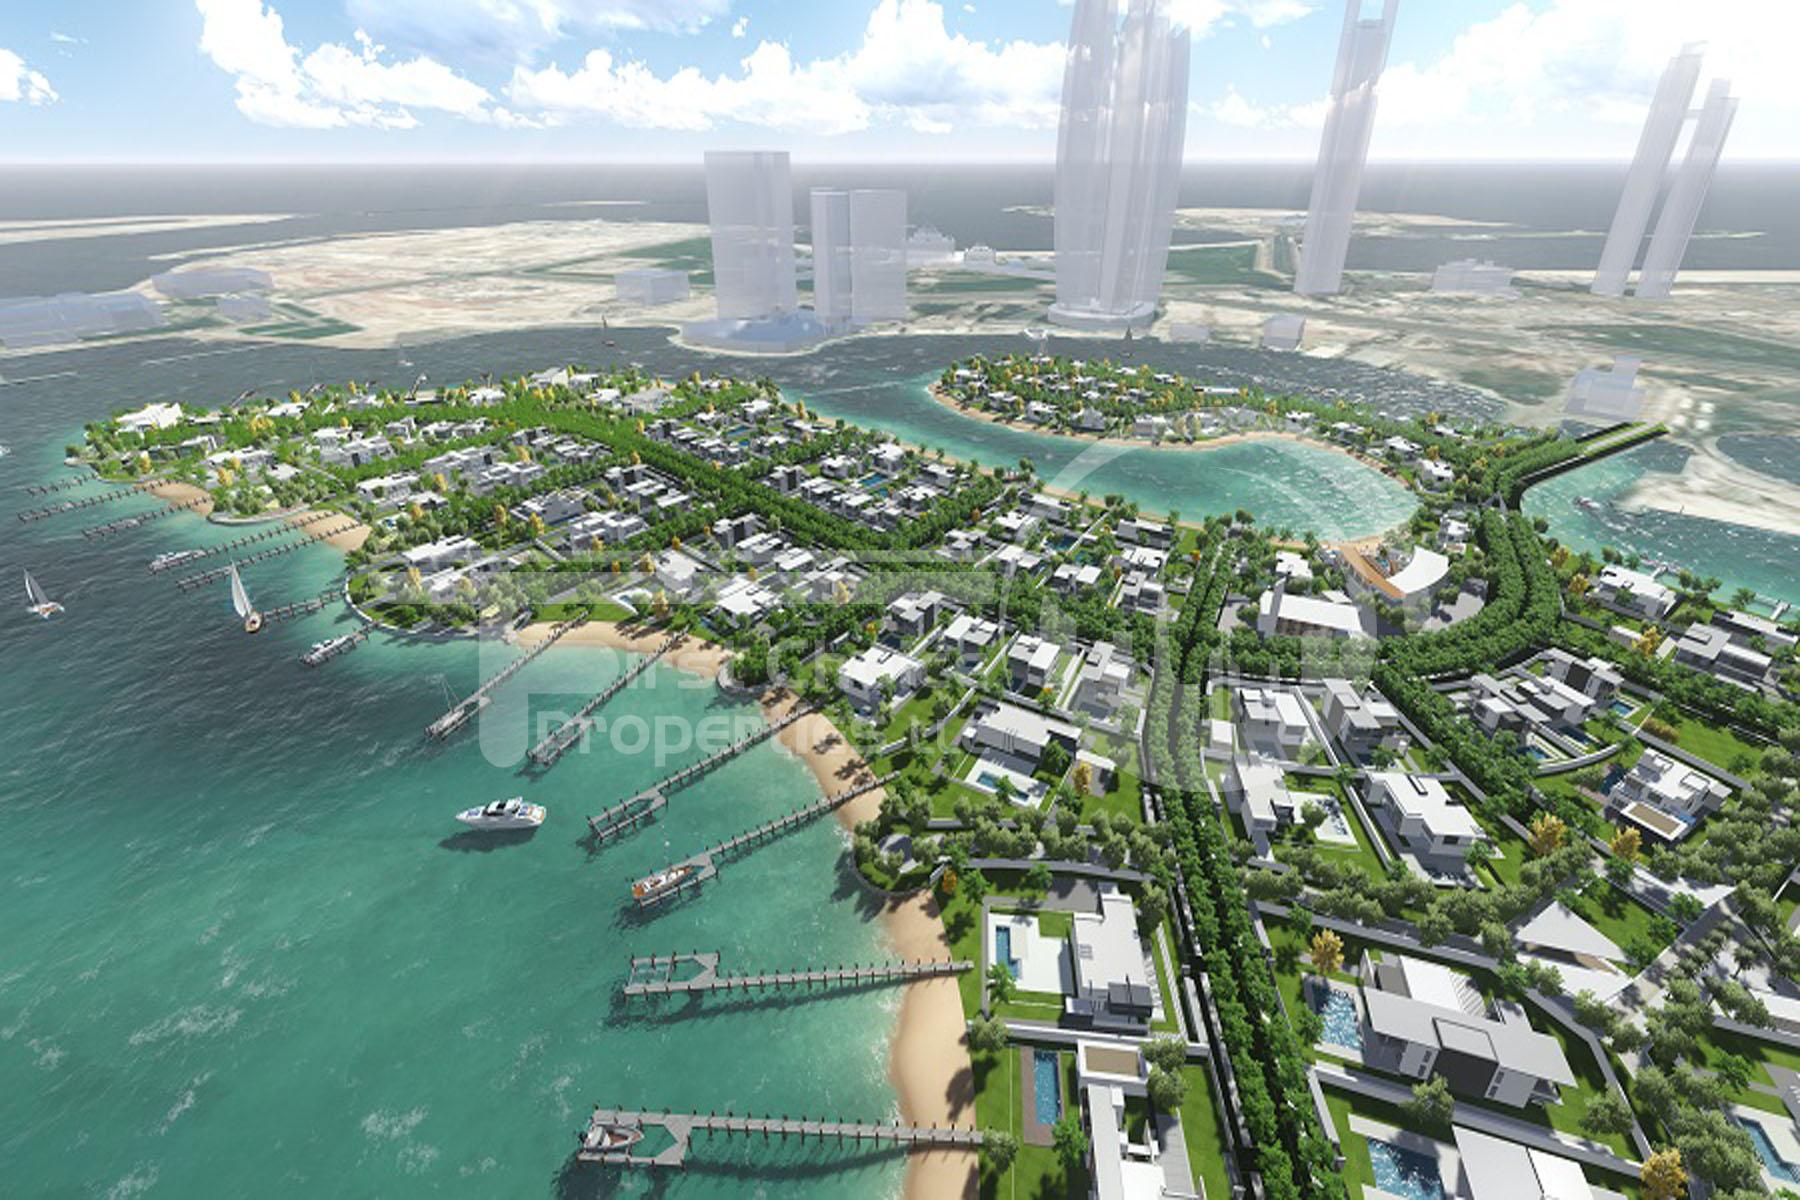 Residential Island - Nareel Island - Al Bateen - Abu Dhabi - UAE (10).jpg